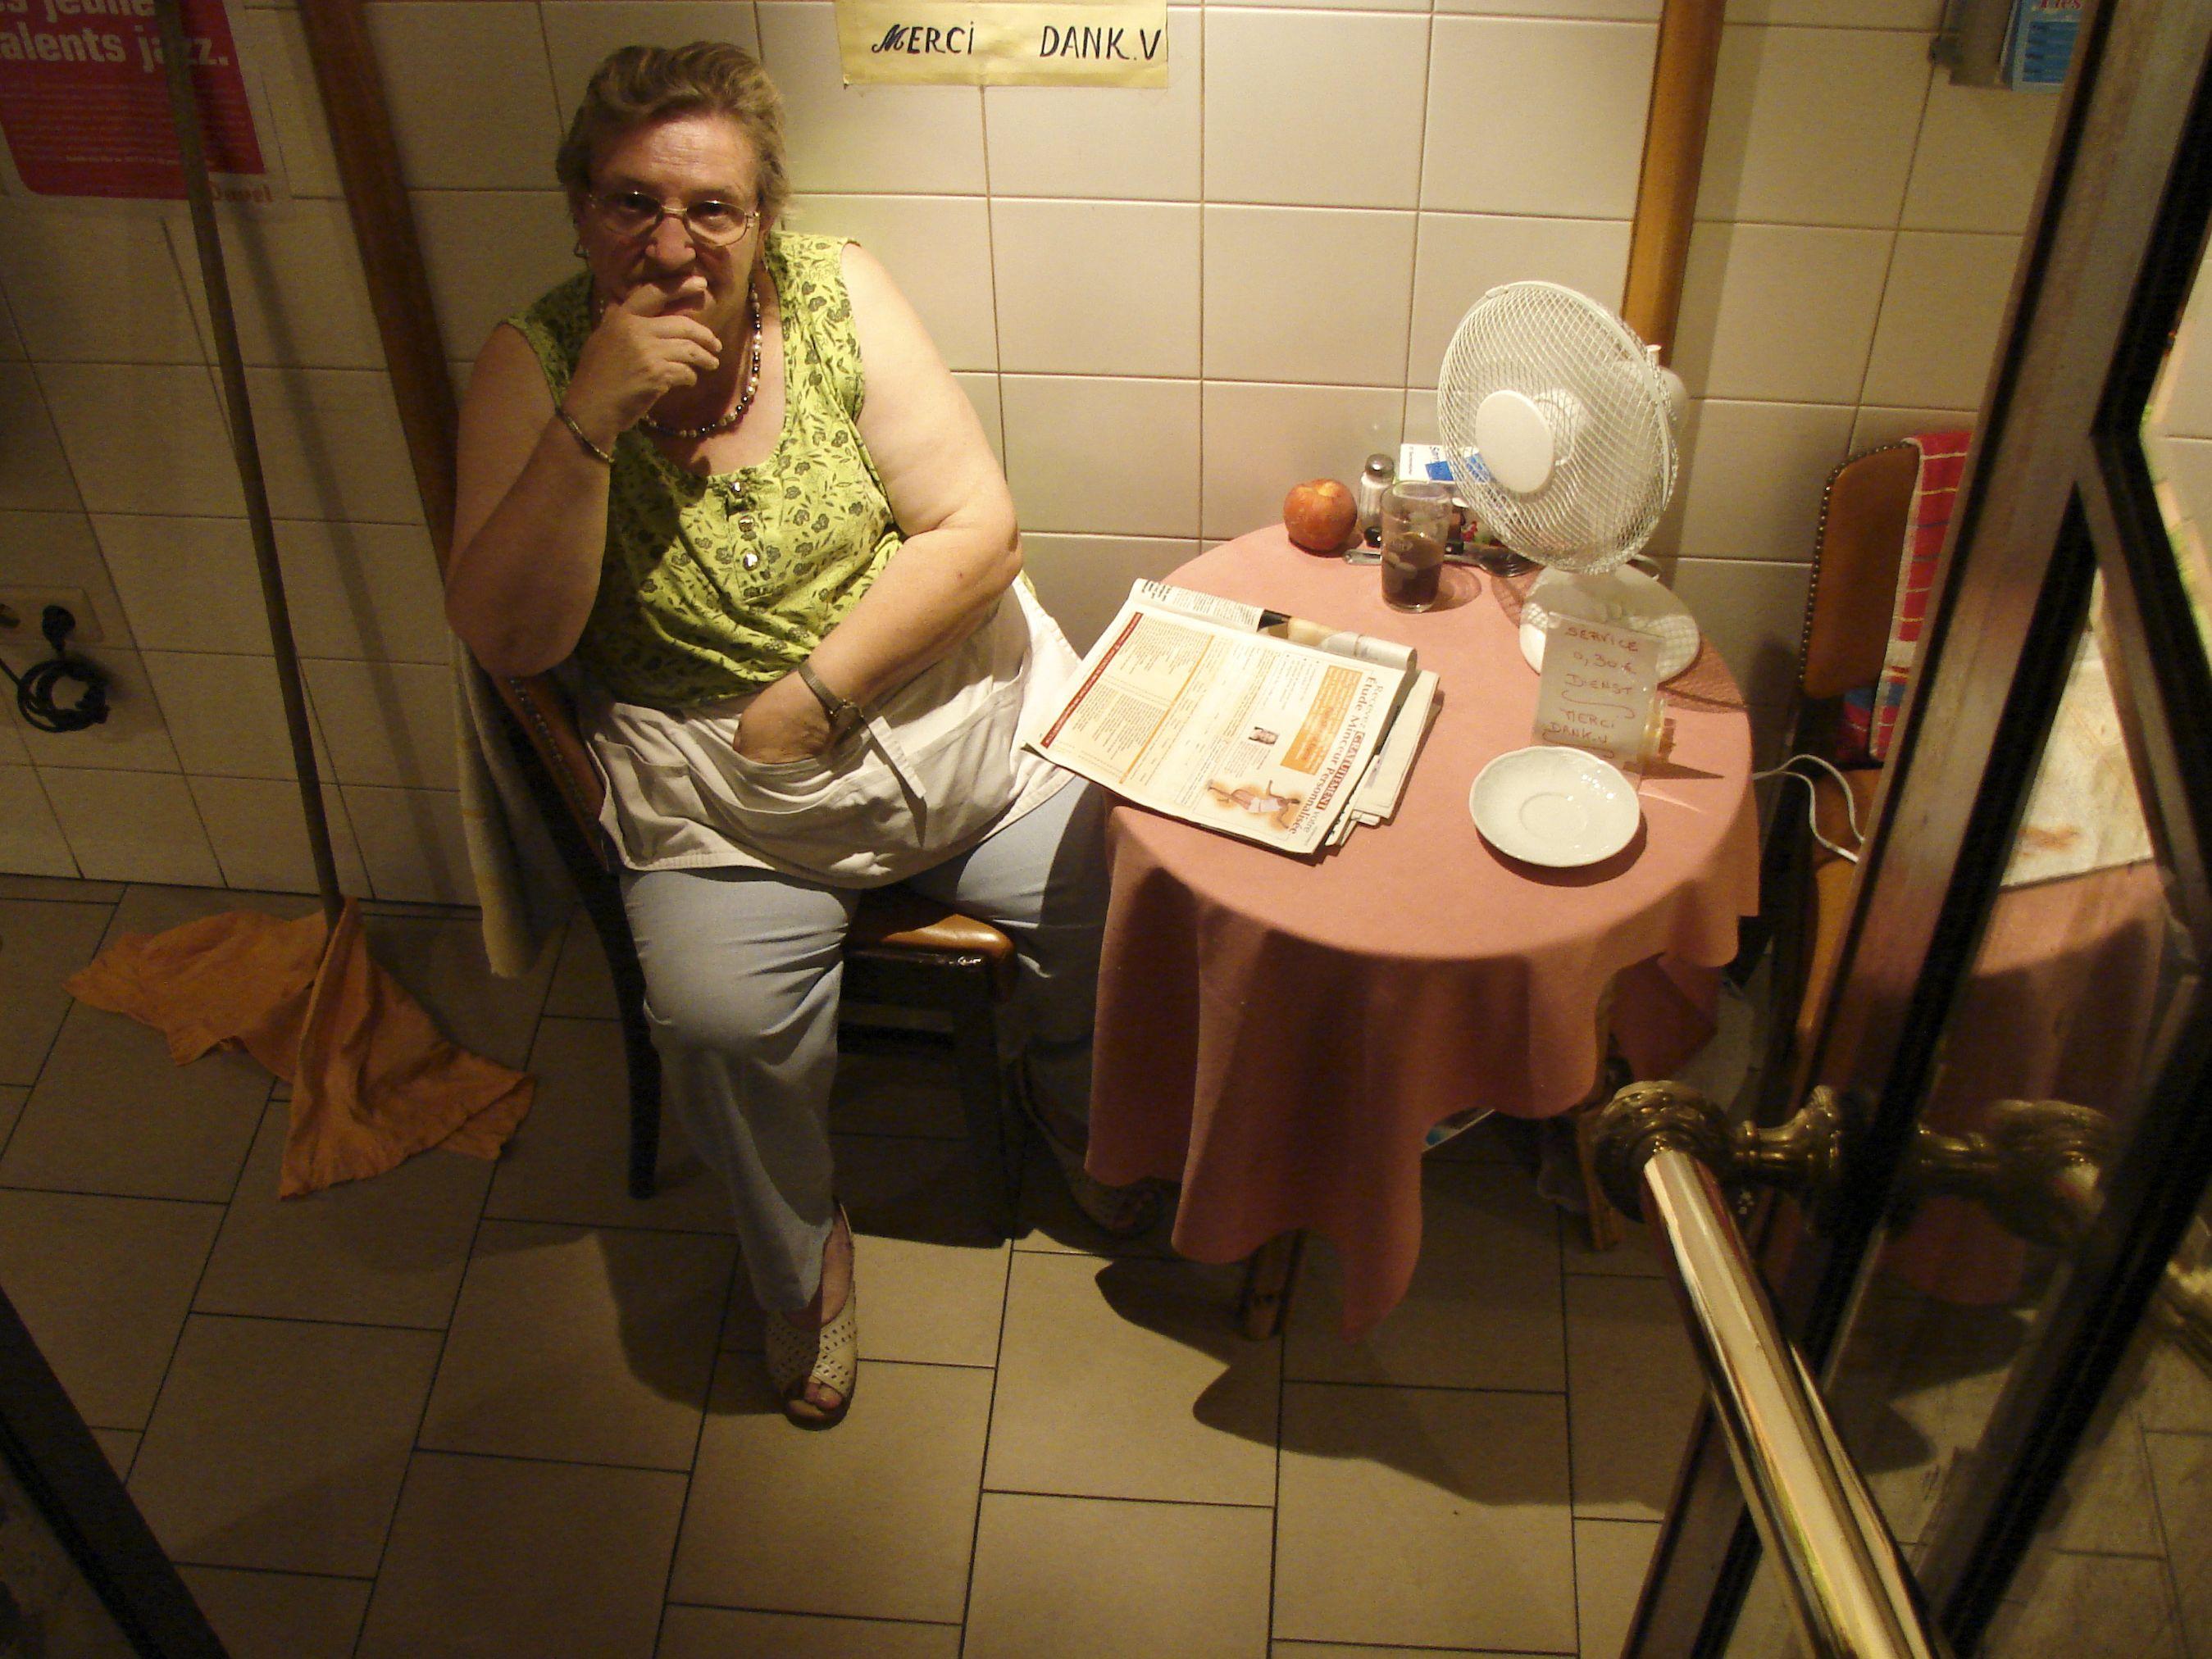 Bathroom Attendant Warm